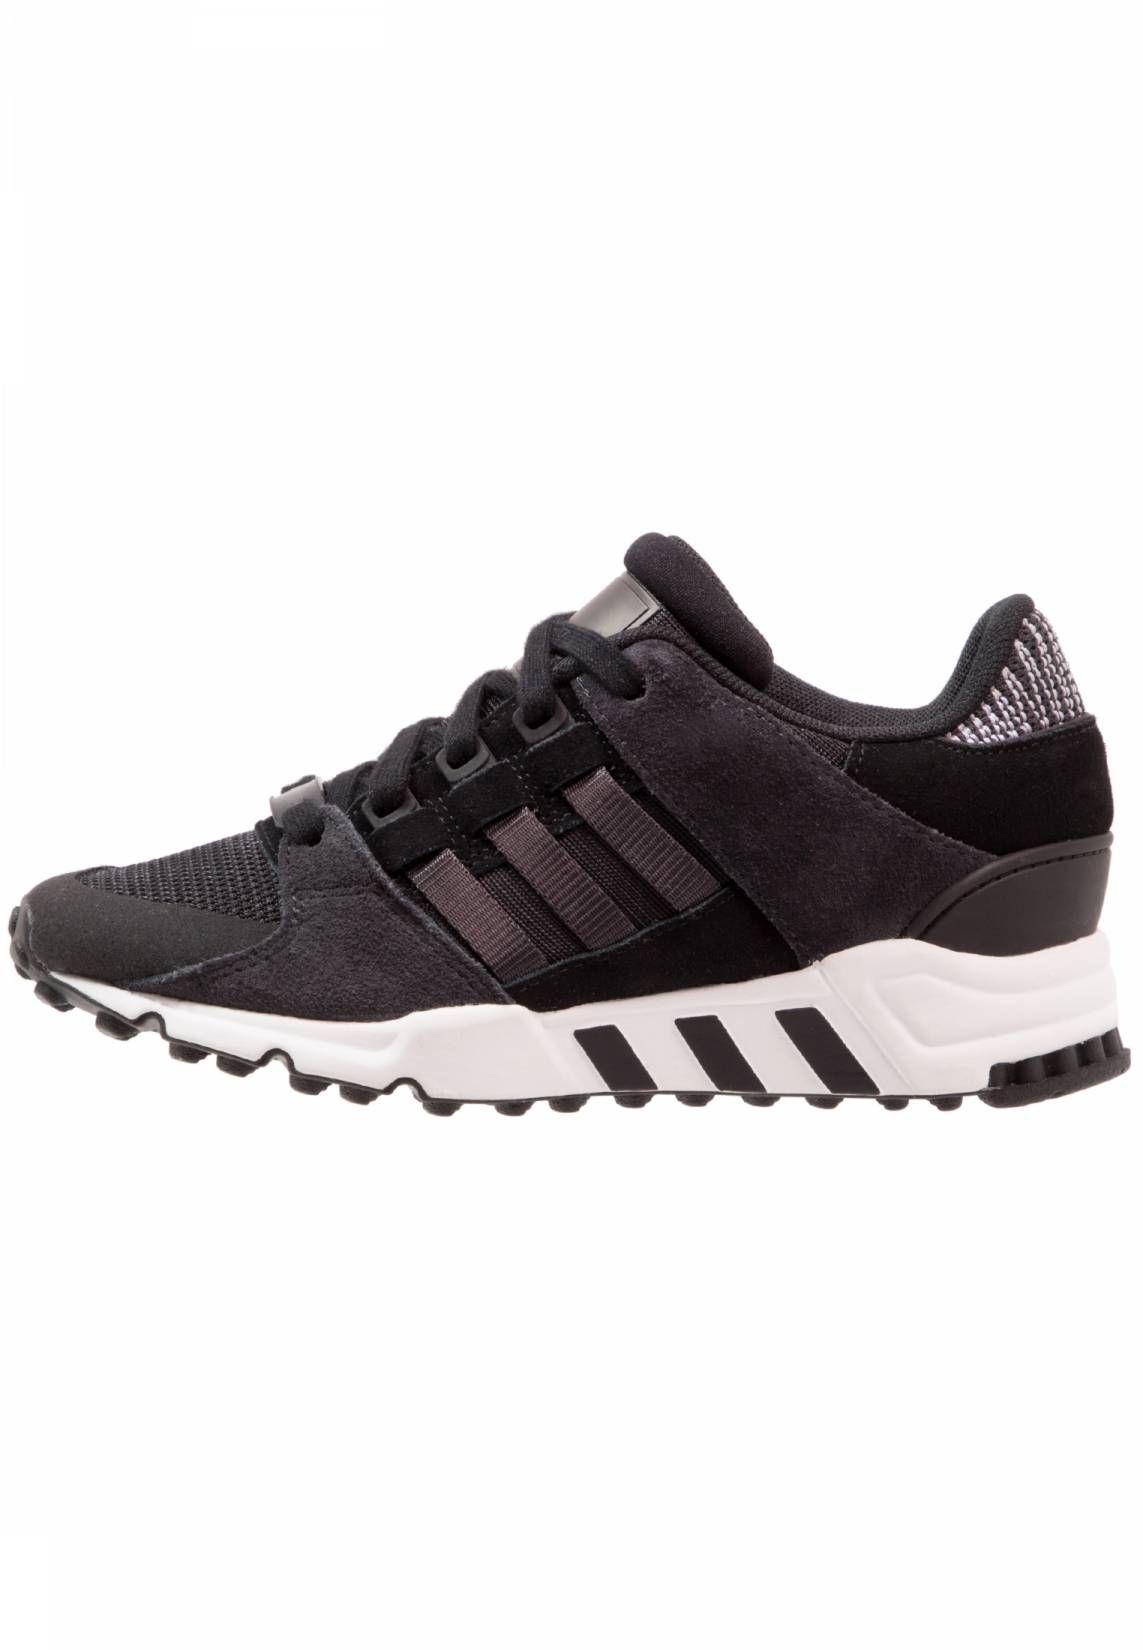 96ee29d128 scarpe adidas eqt fantasia